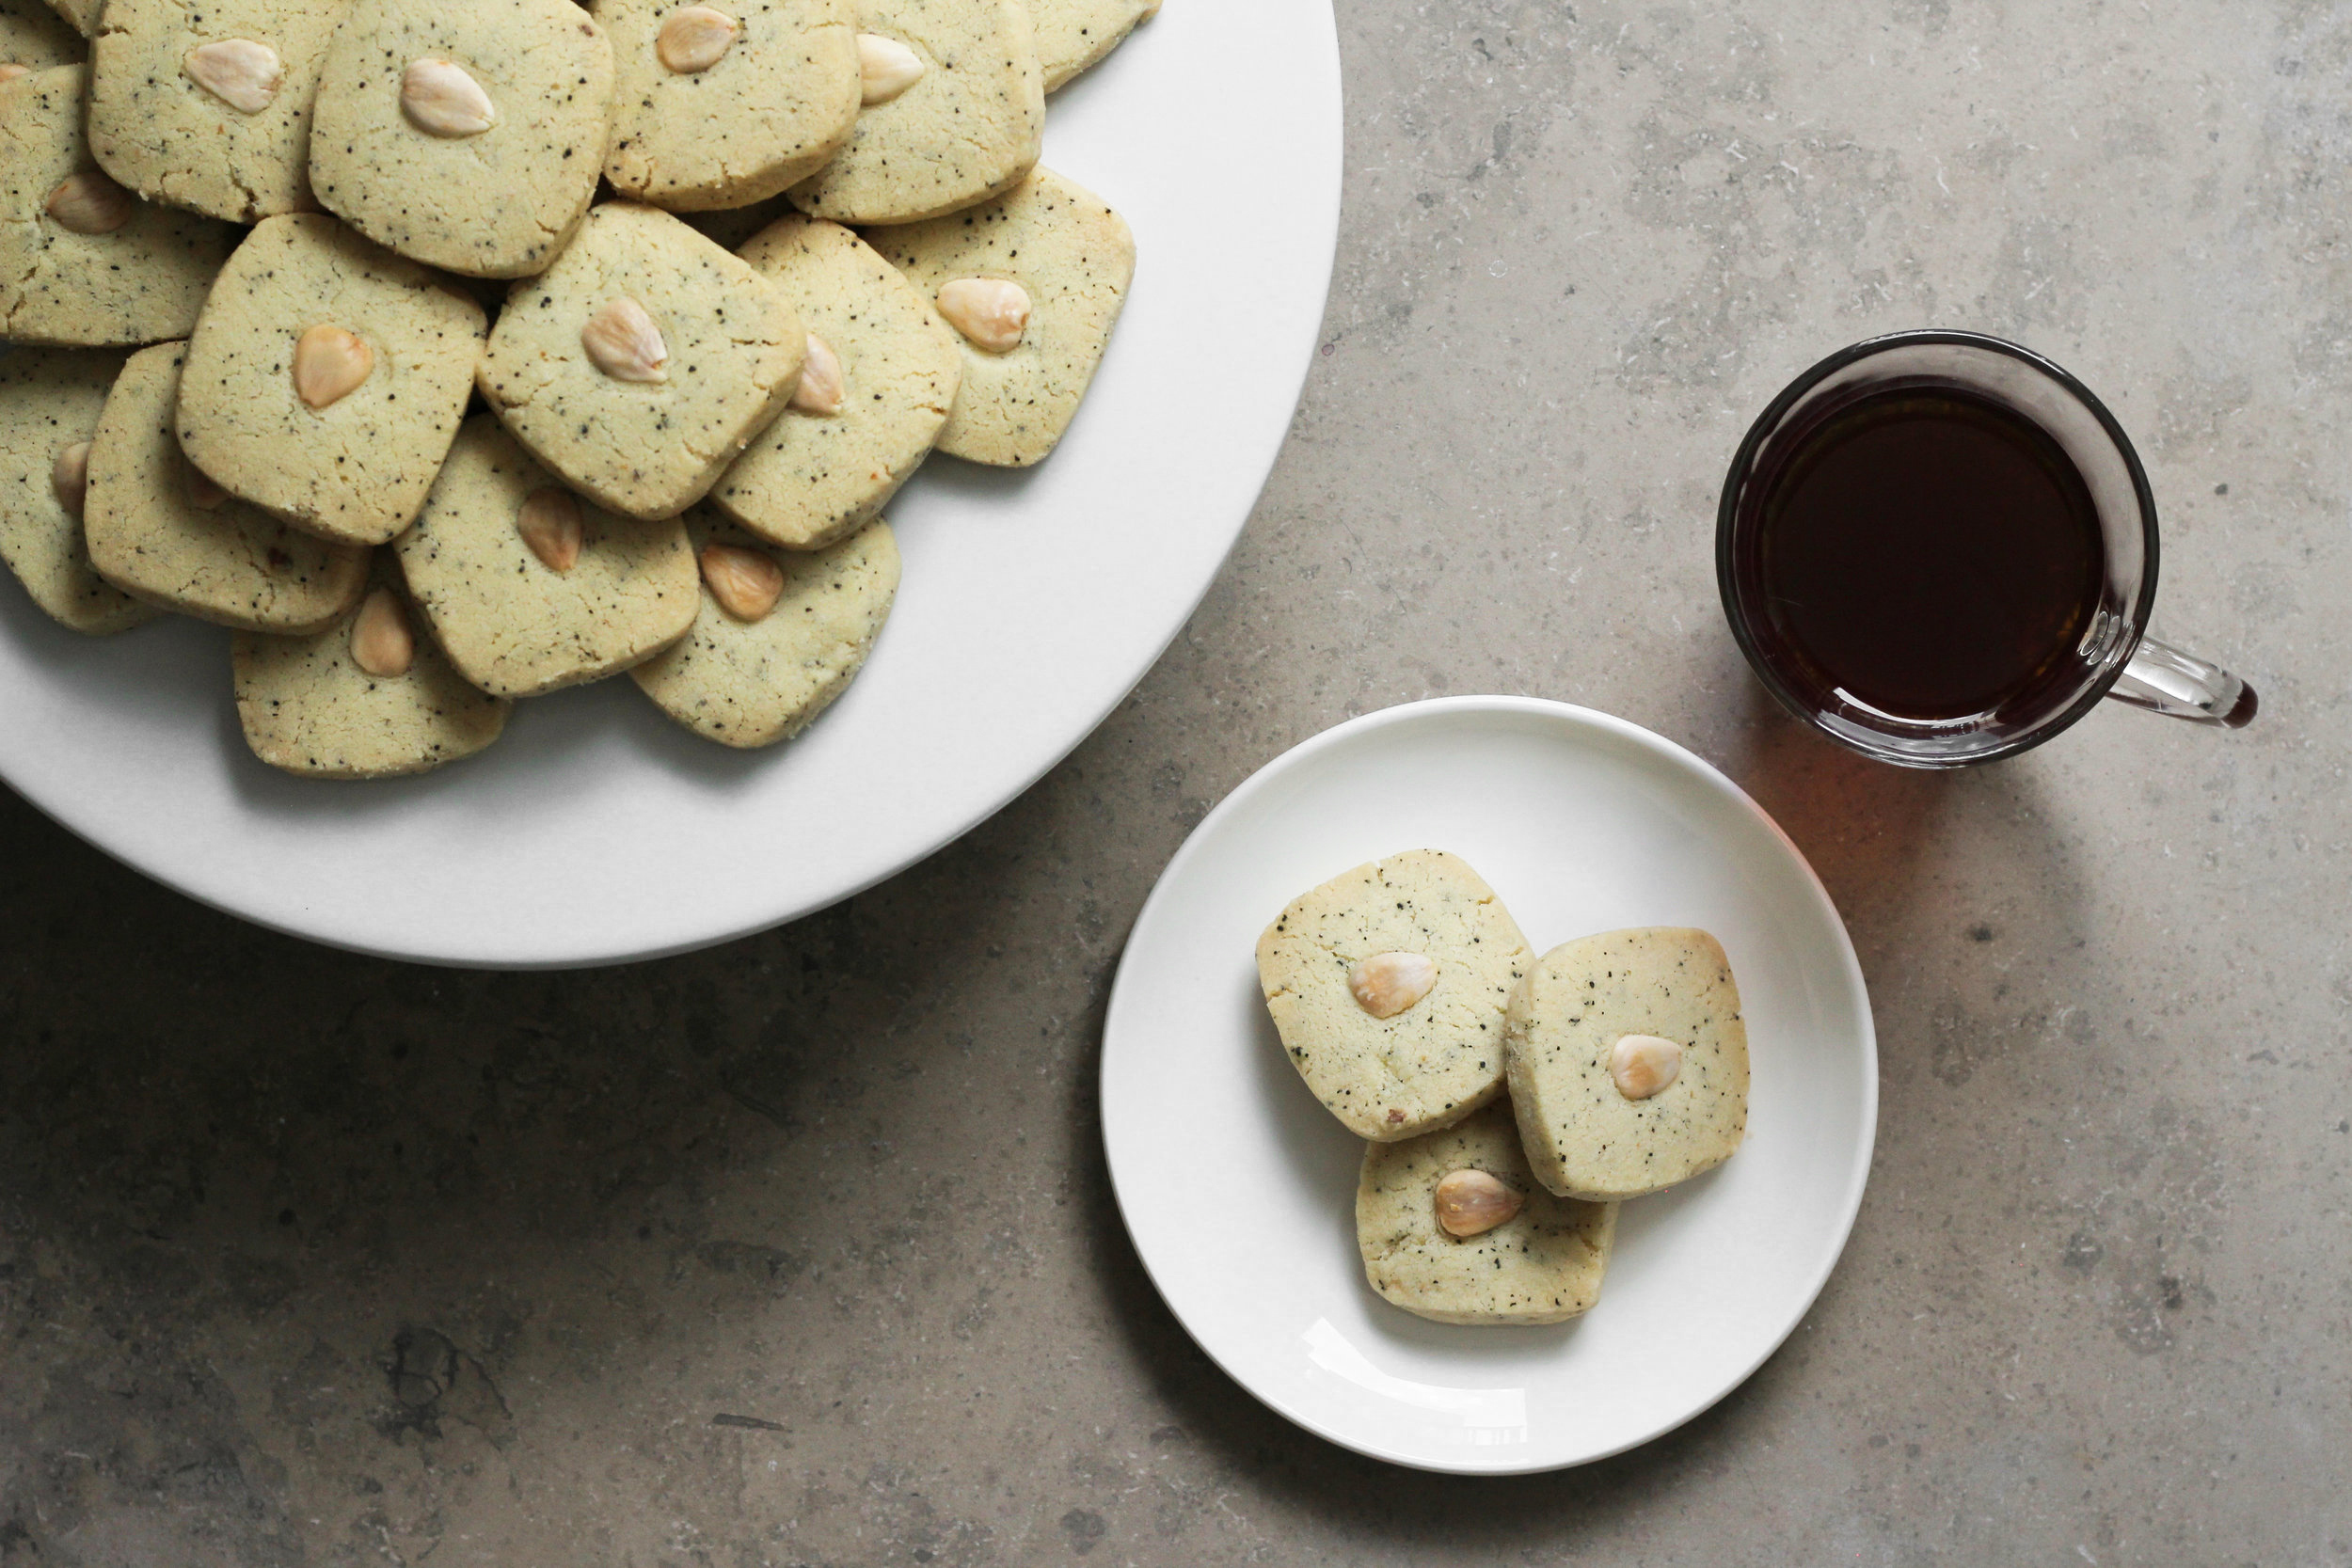 cardamom and tea ghraybeh (shortbread)